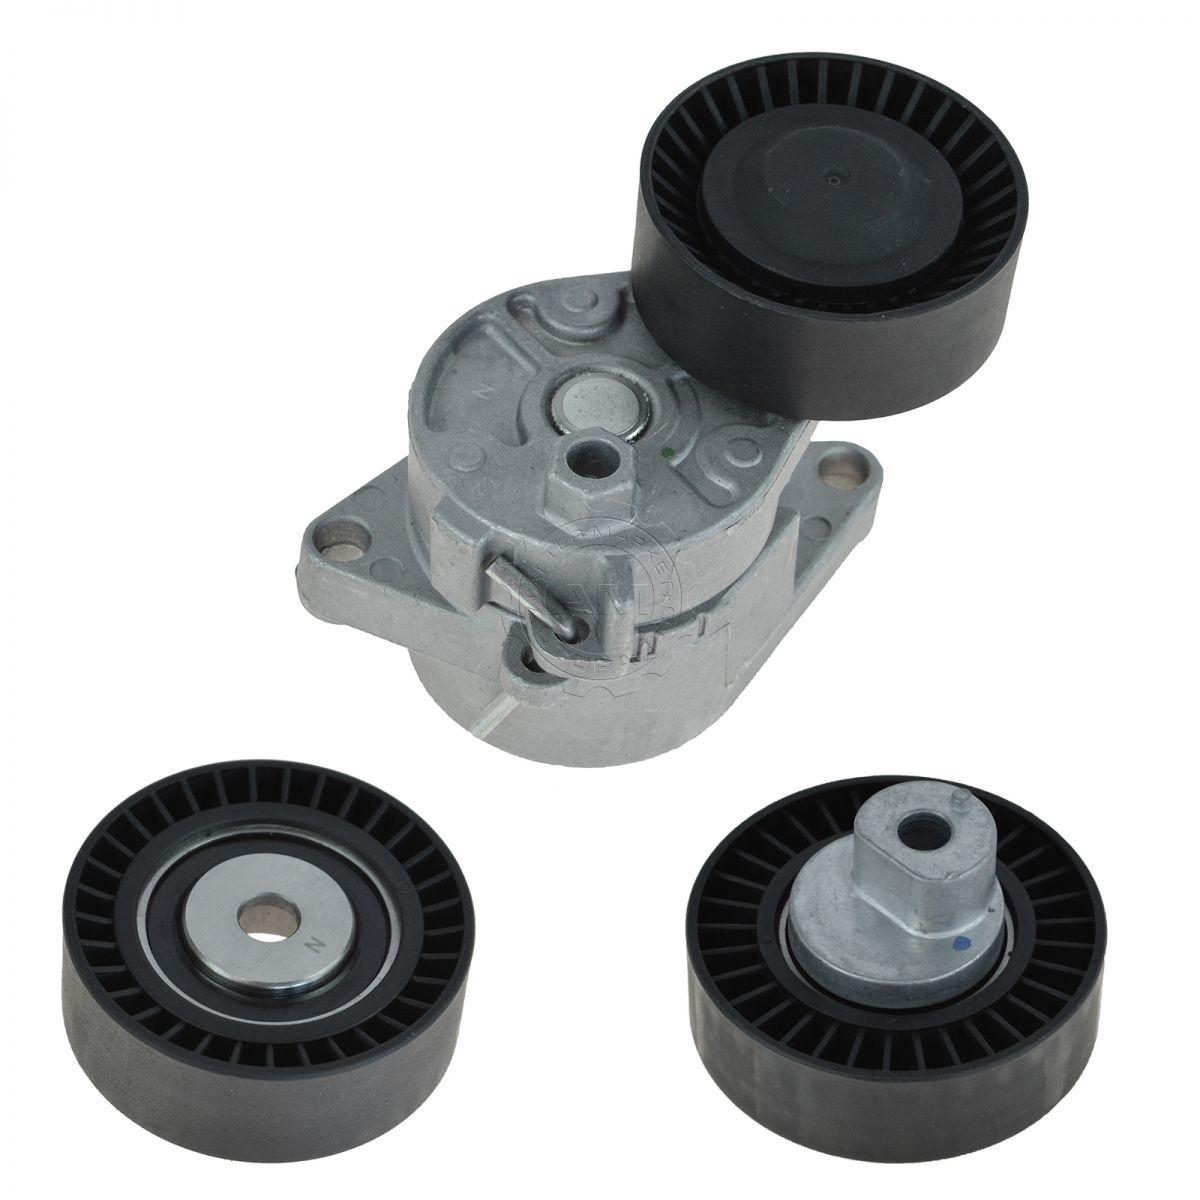 hight resolution of serpentine belt tensioner idler pulley kit set for bmw e36 e39 e46 e53